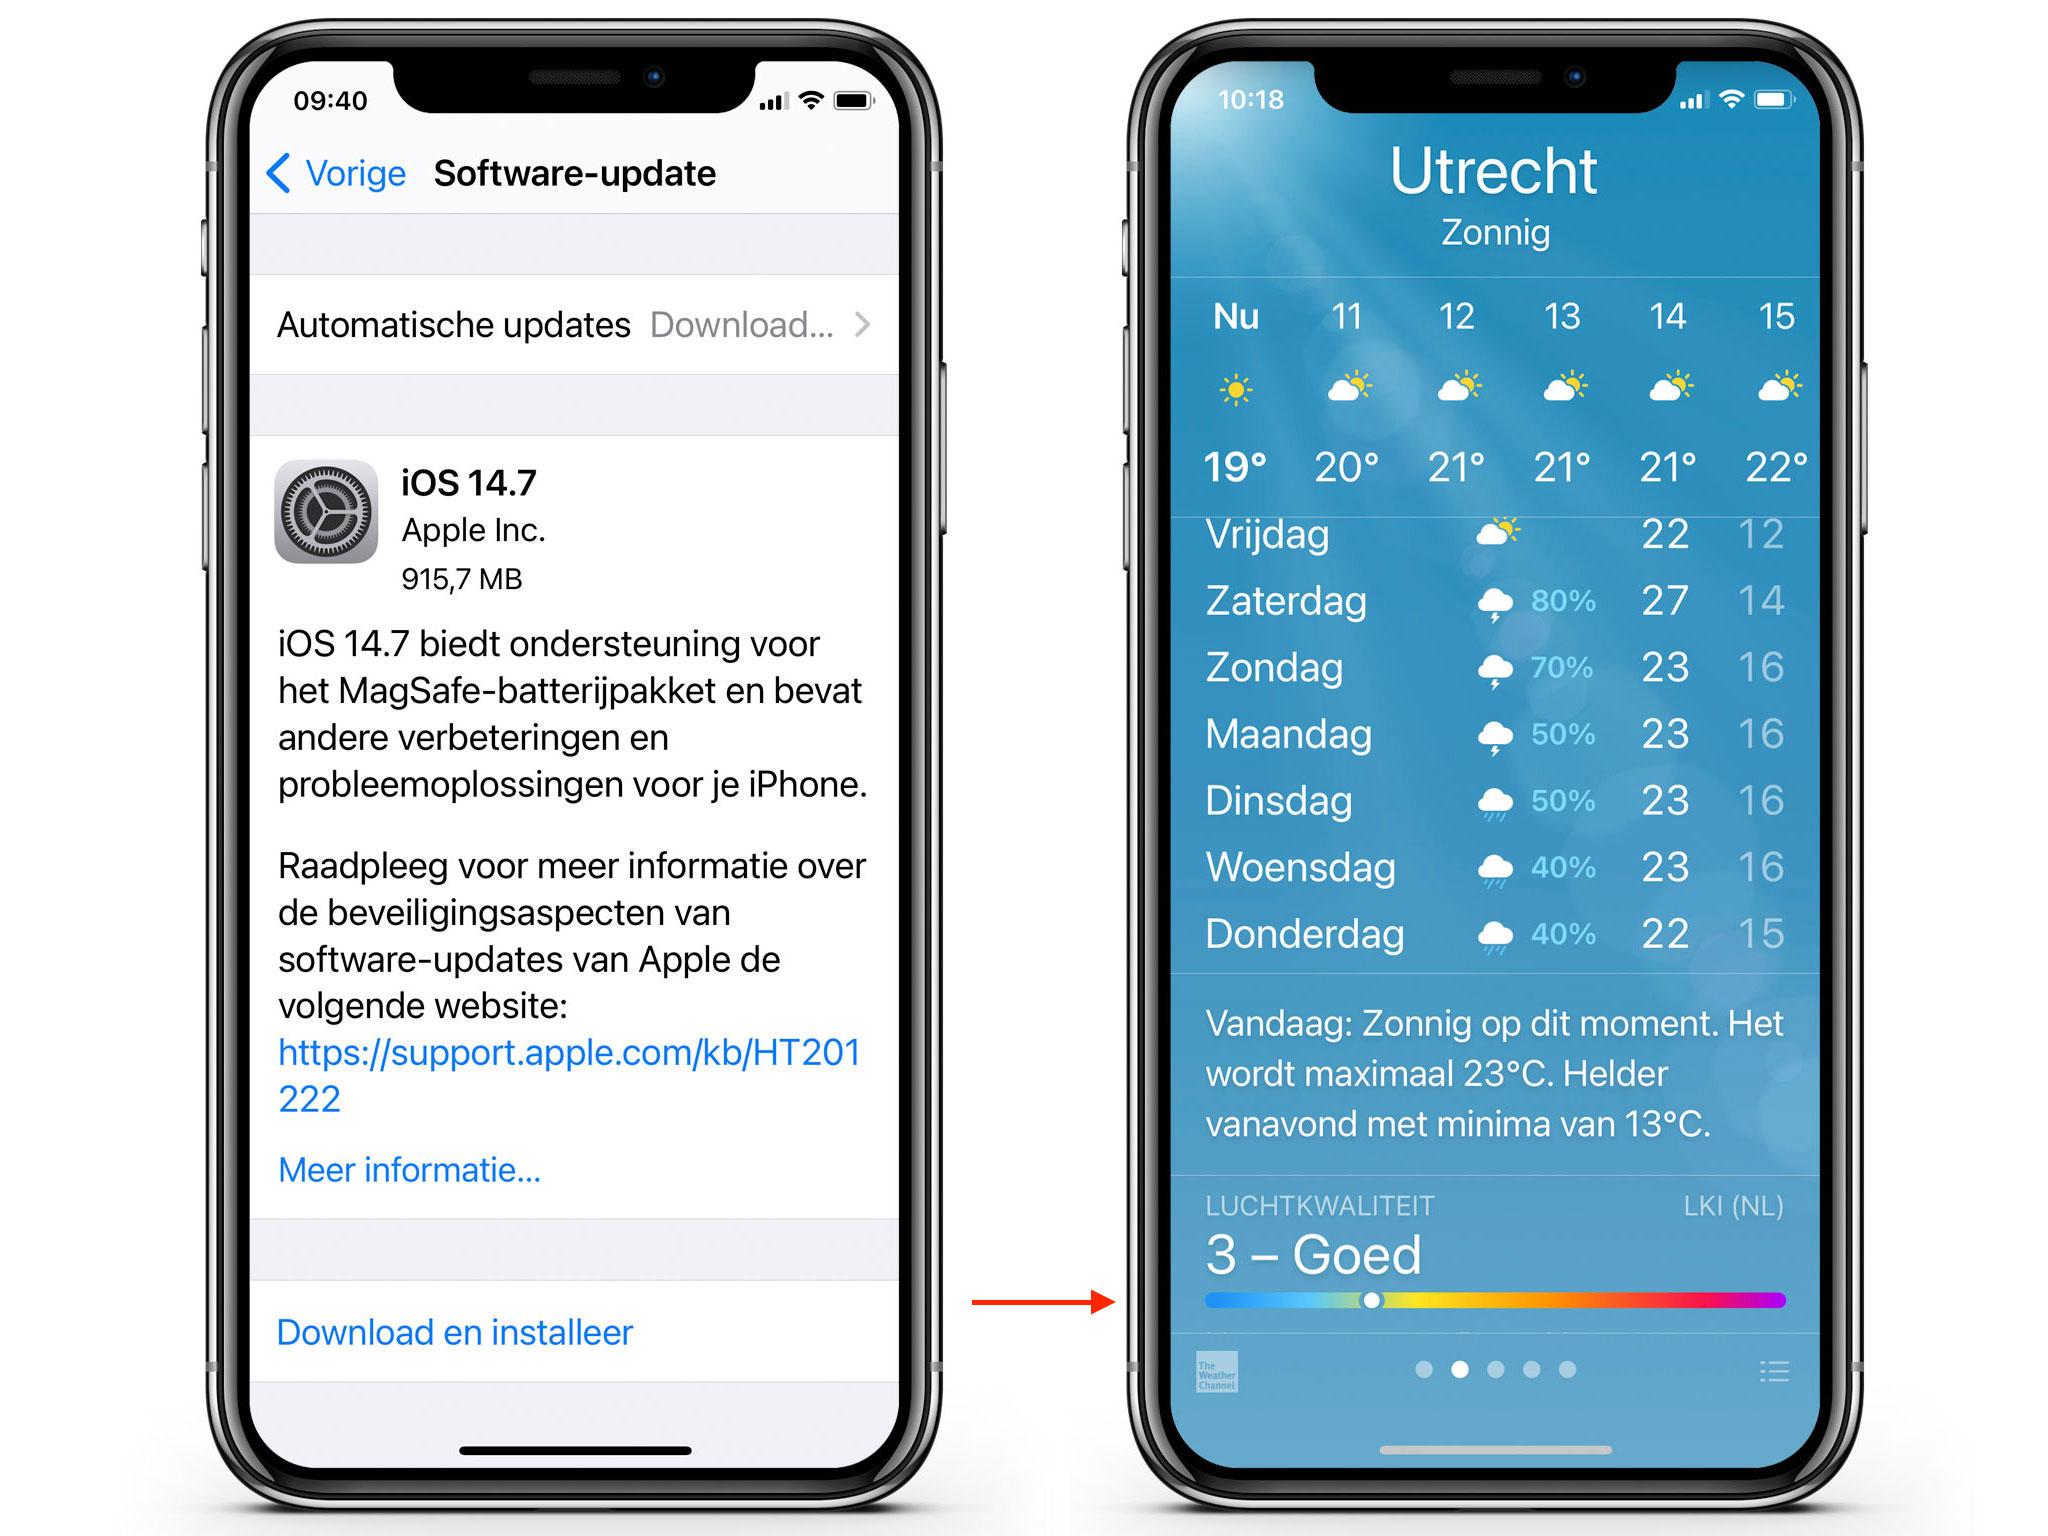 https://www.macfreak.nl/modules/news/images/zArt.iOS14.7ReleaseNotesEnLuchtkwaliteitWeer-app.jpg